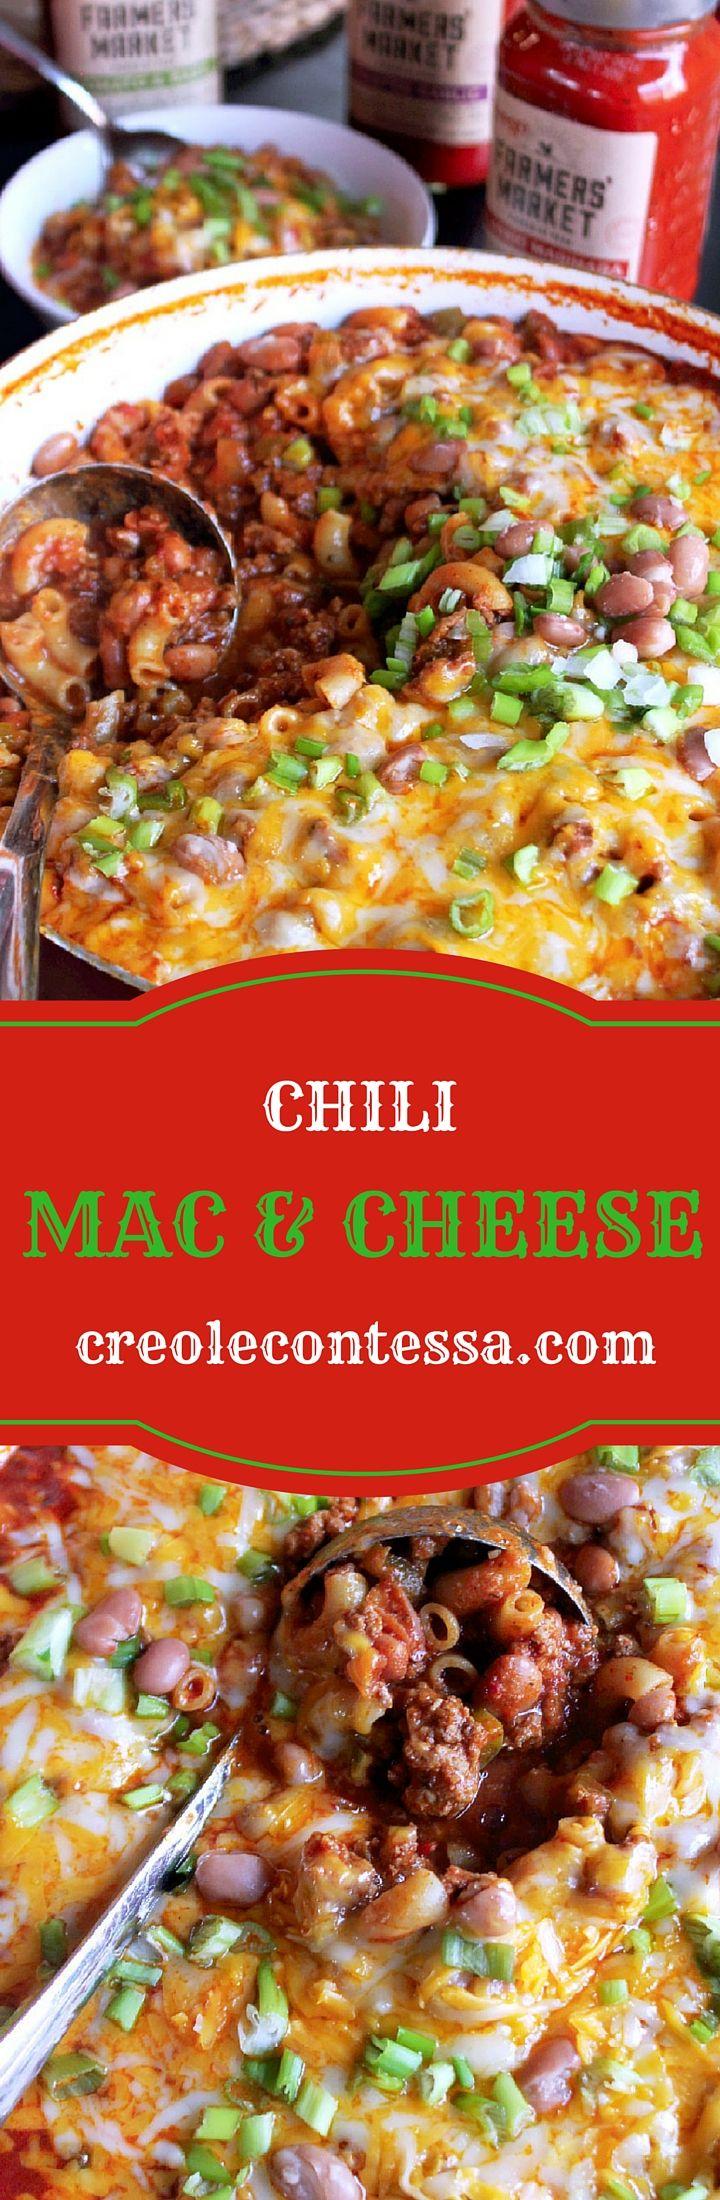 Chili Mac & Cheese with Prego® Farmers' Market-Creole Contessa #ad #PickedAtPeak